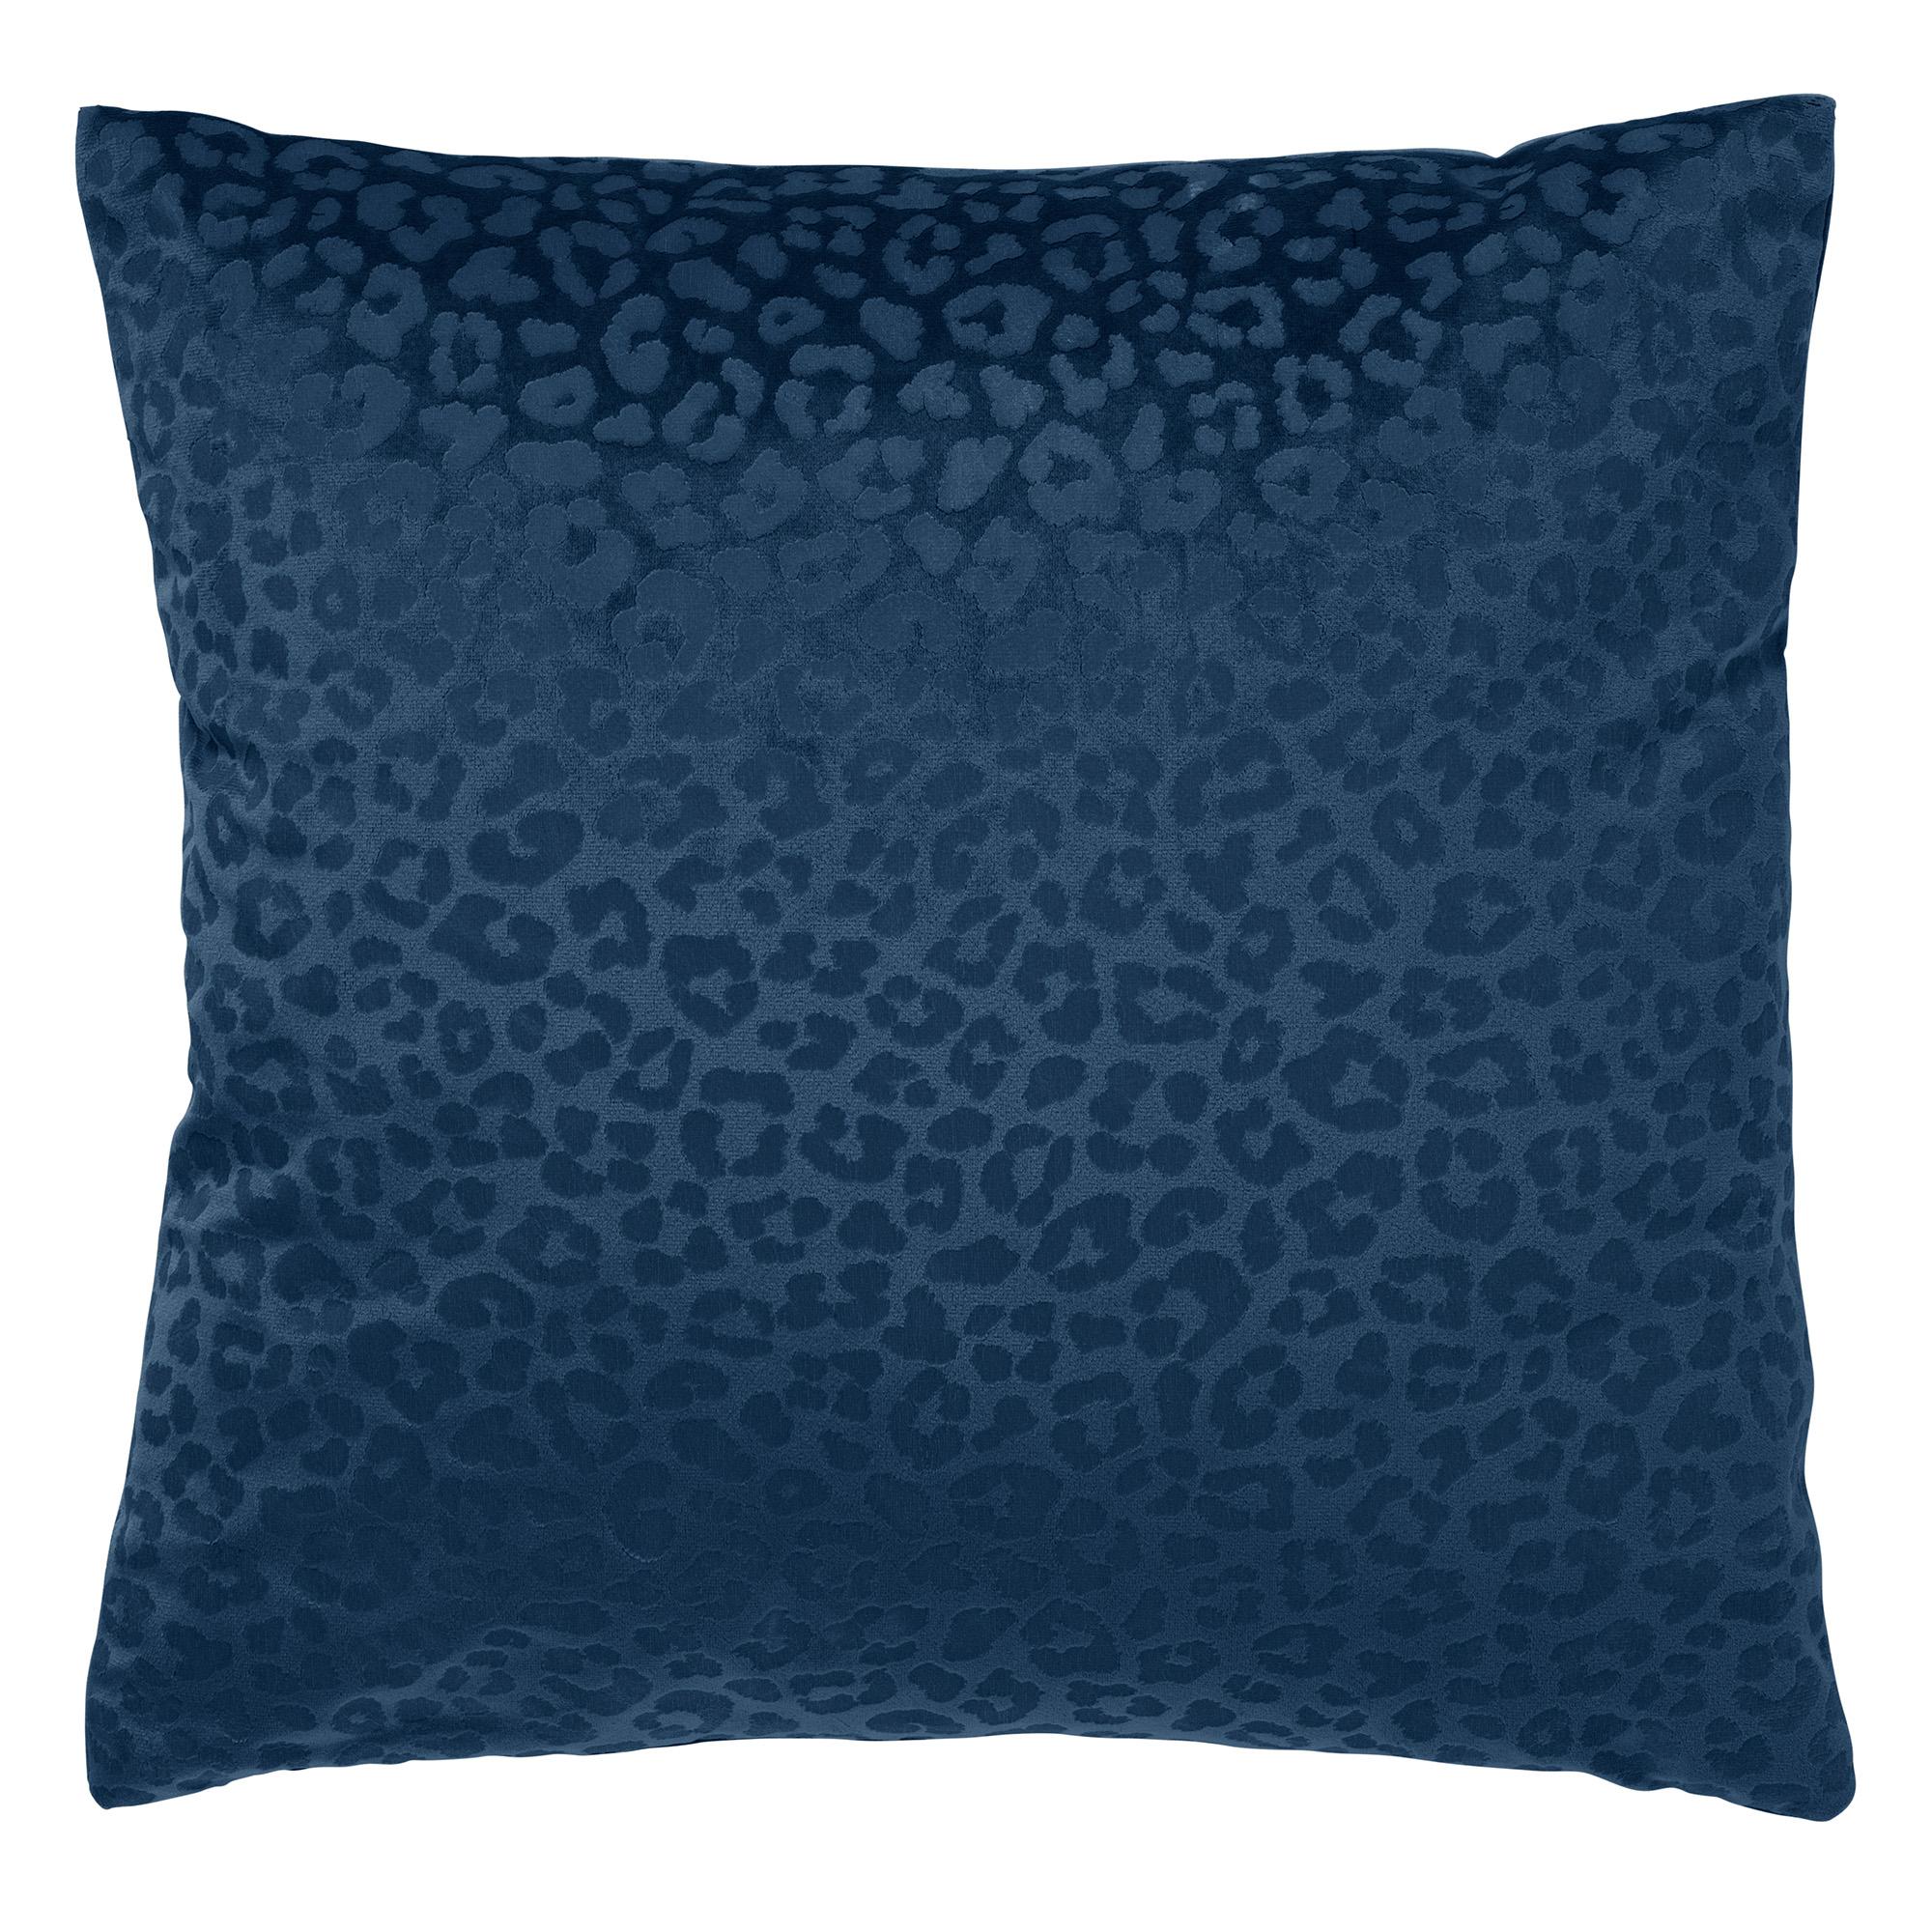 CHESSY - Kussenhoes met dierenprint 45x45 cm Insignia Blue